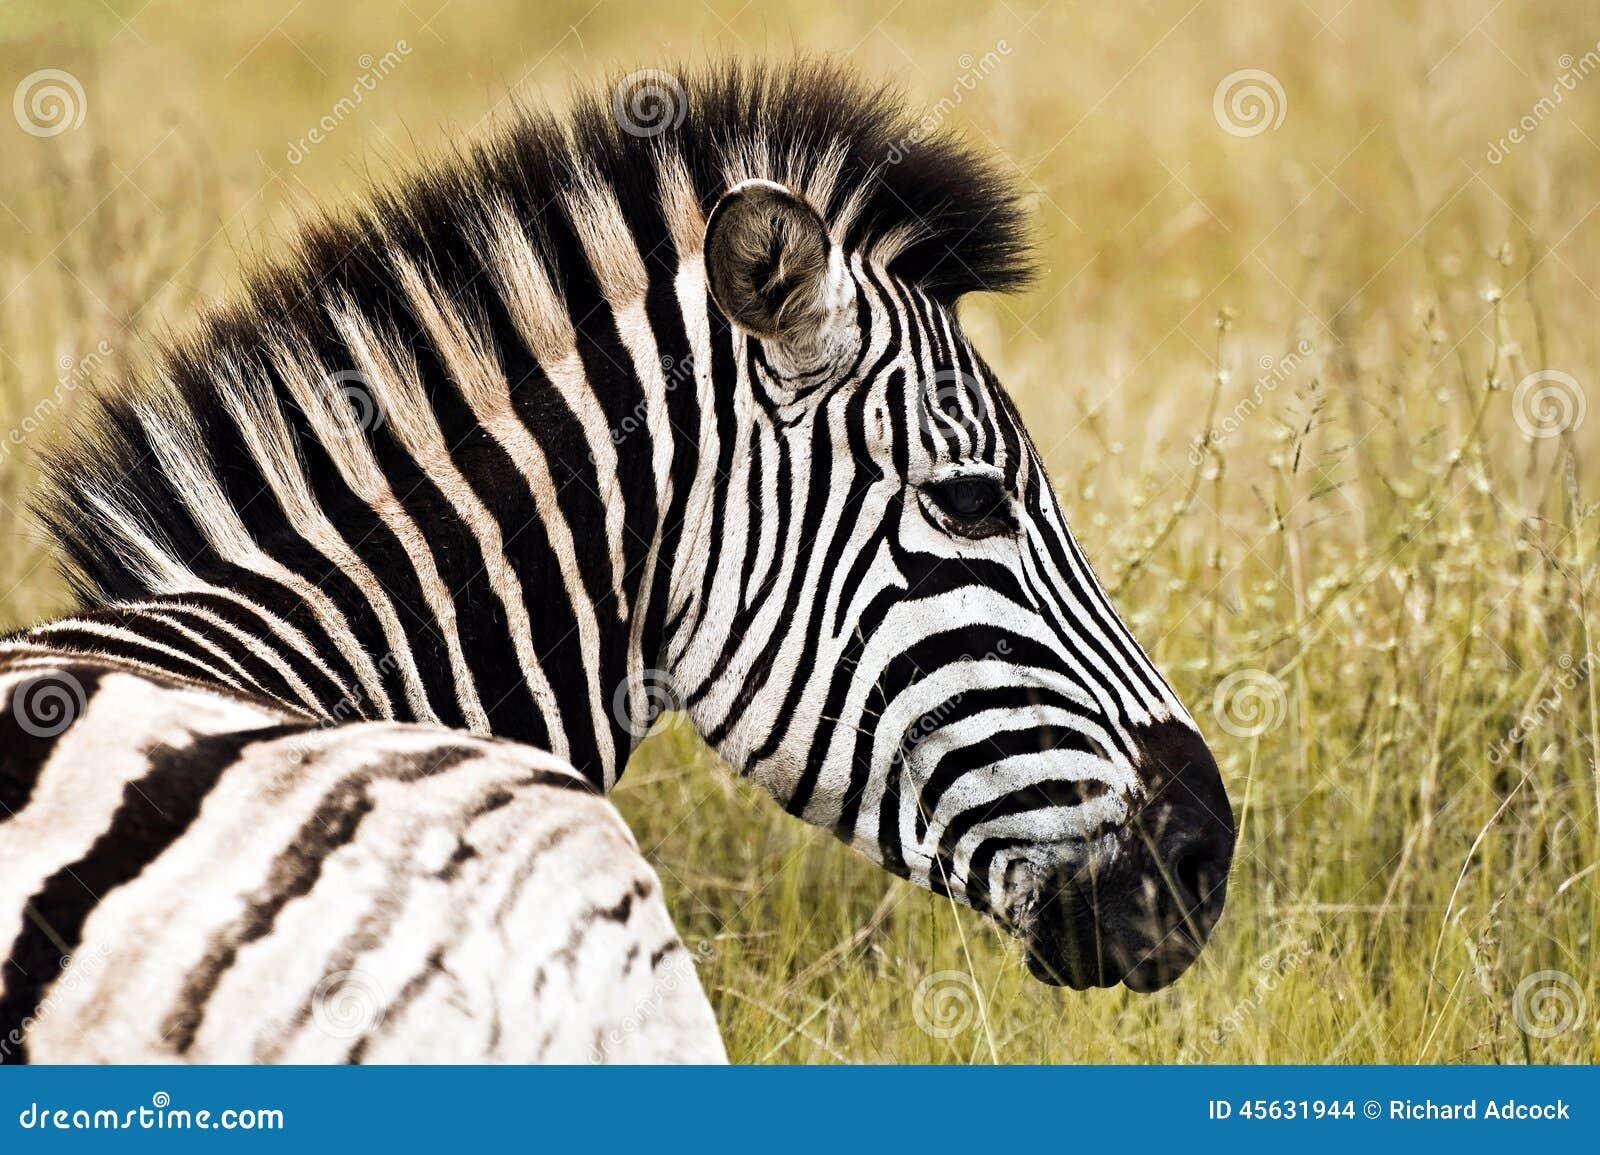 Perfil de la cebra foto de archivo. Imagen de pets, animal - 45631944